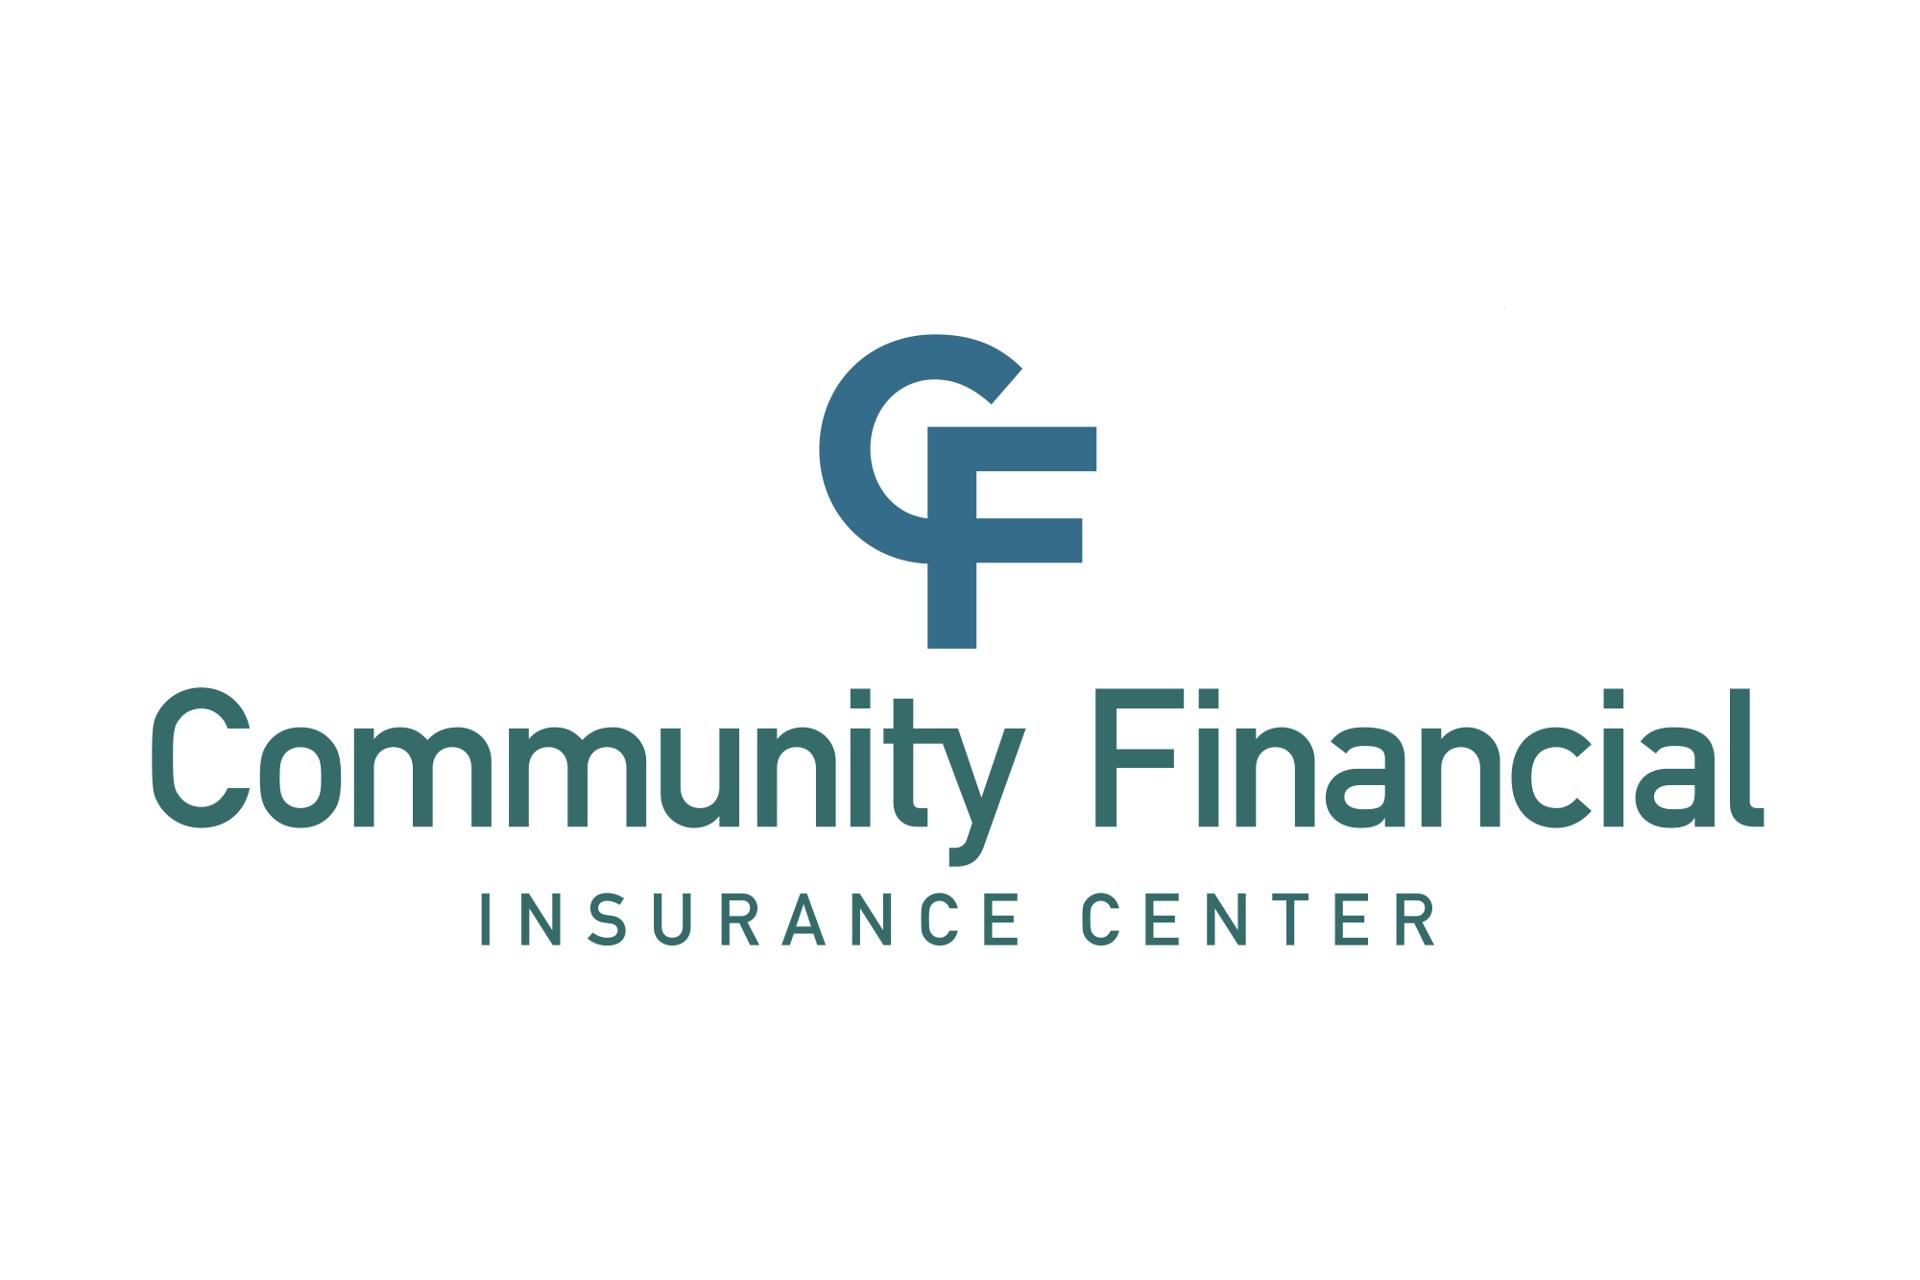 Community Financial Identity